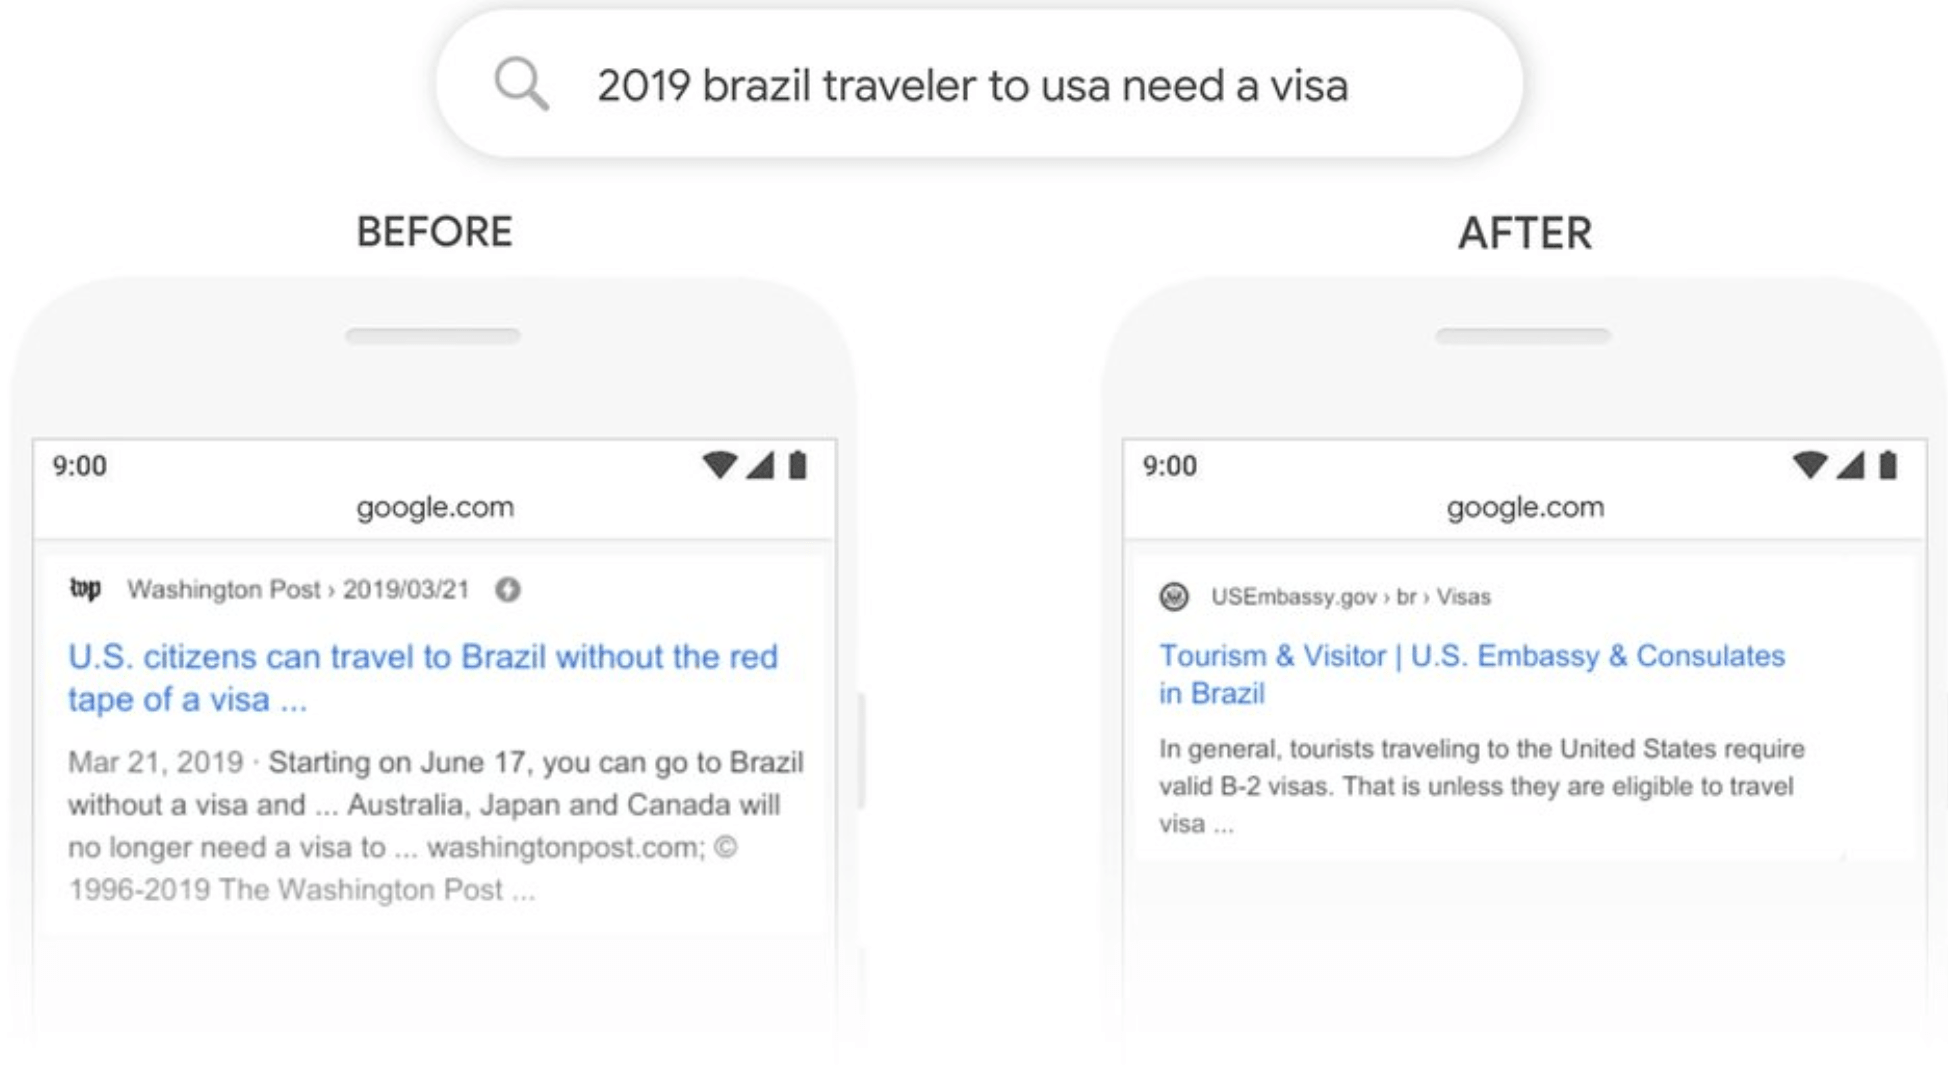 google-bert-exemple-voyage-bresil